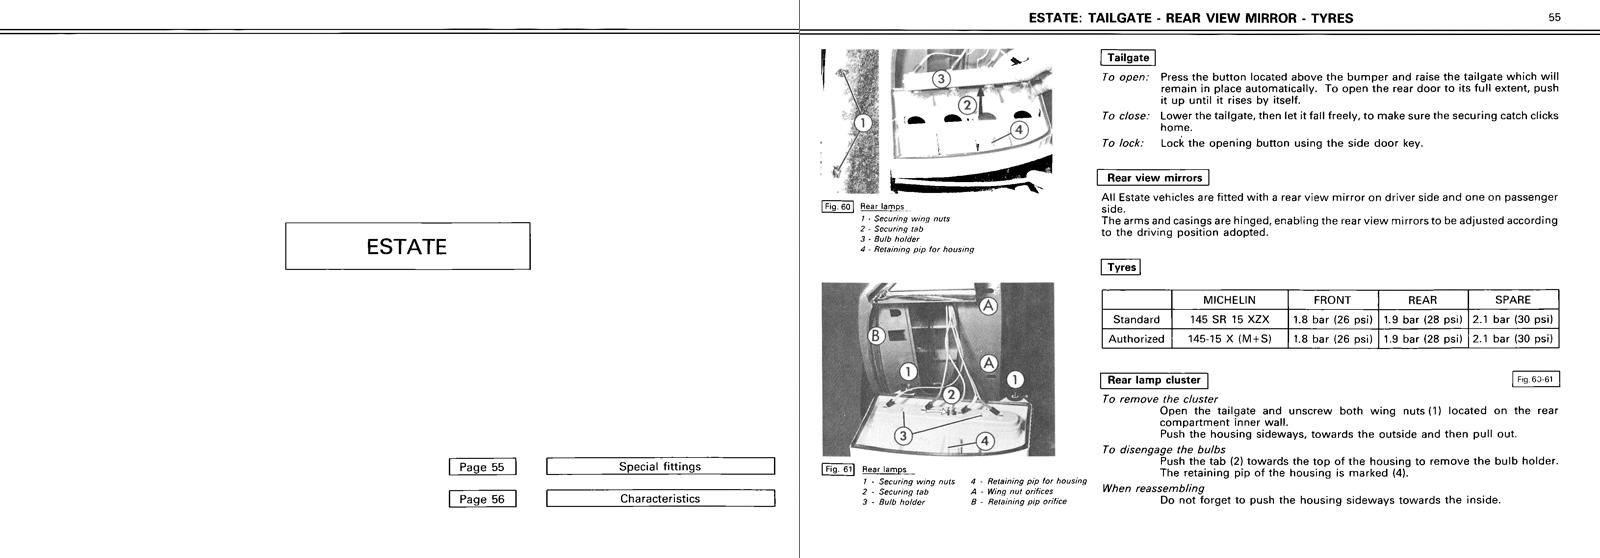 1980 Citroën GSA owner's manual Page 2/title>